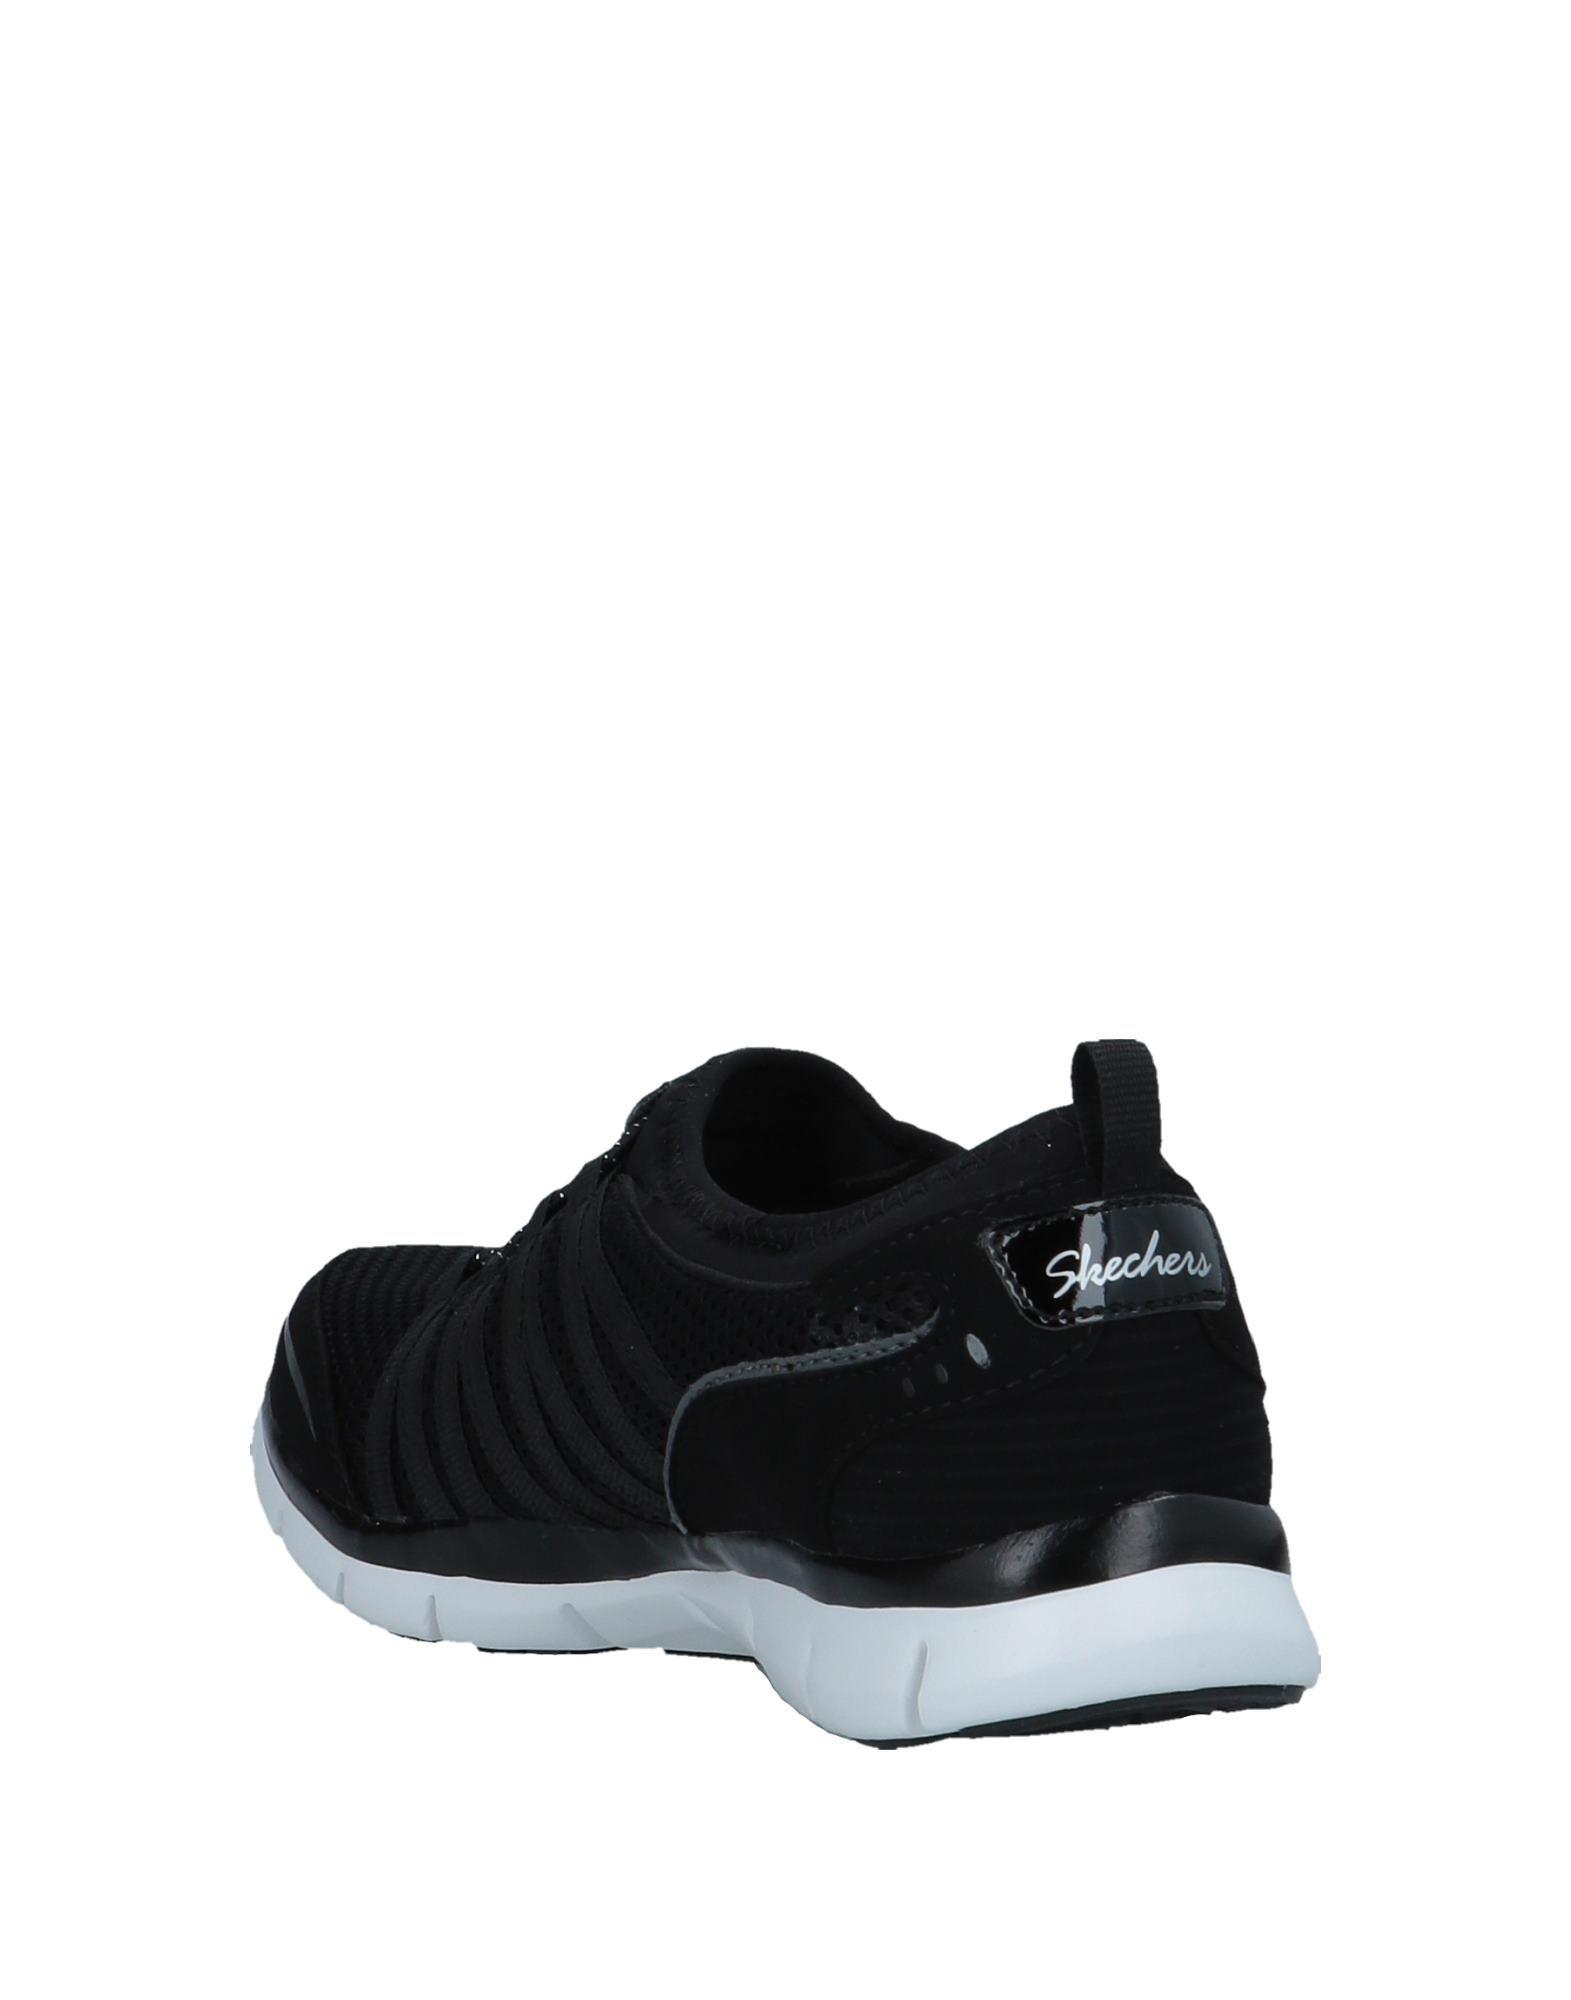 Skechers Sneakers Qualität Damen  11528912OF Gute Qualität Sneakers beliebte Schuhe 9fa271